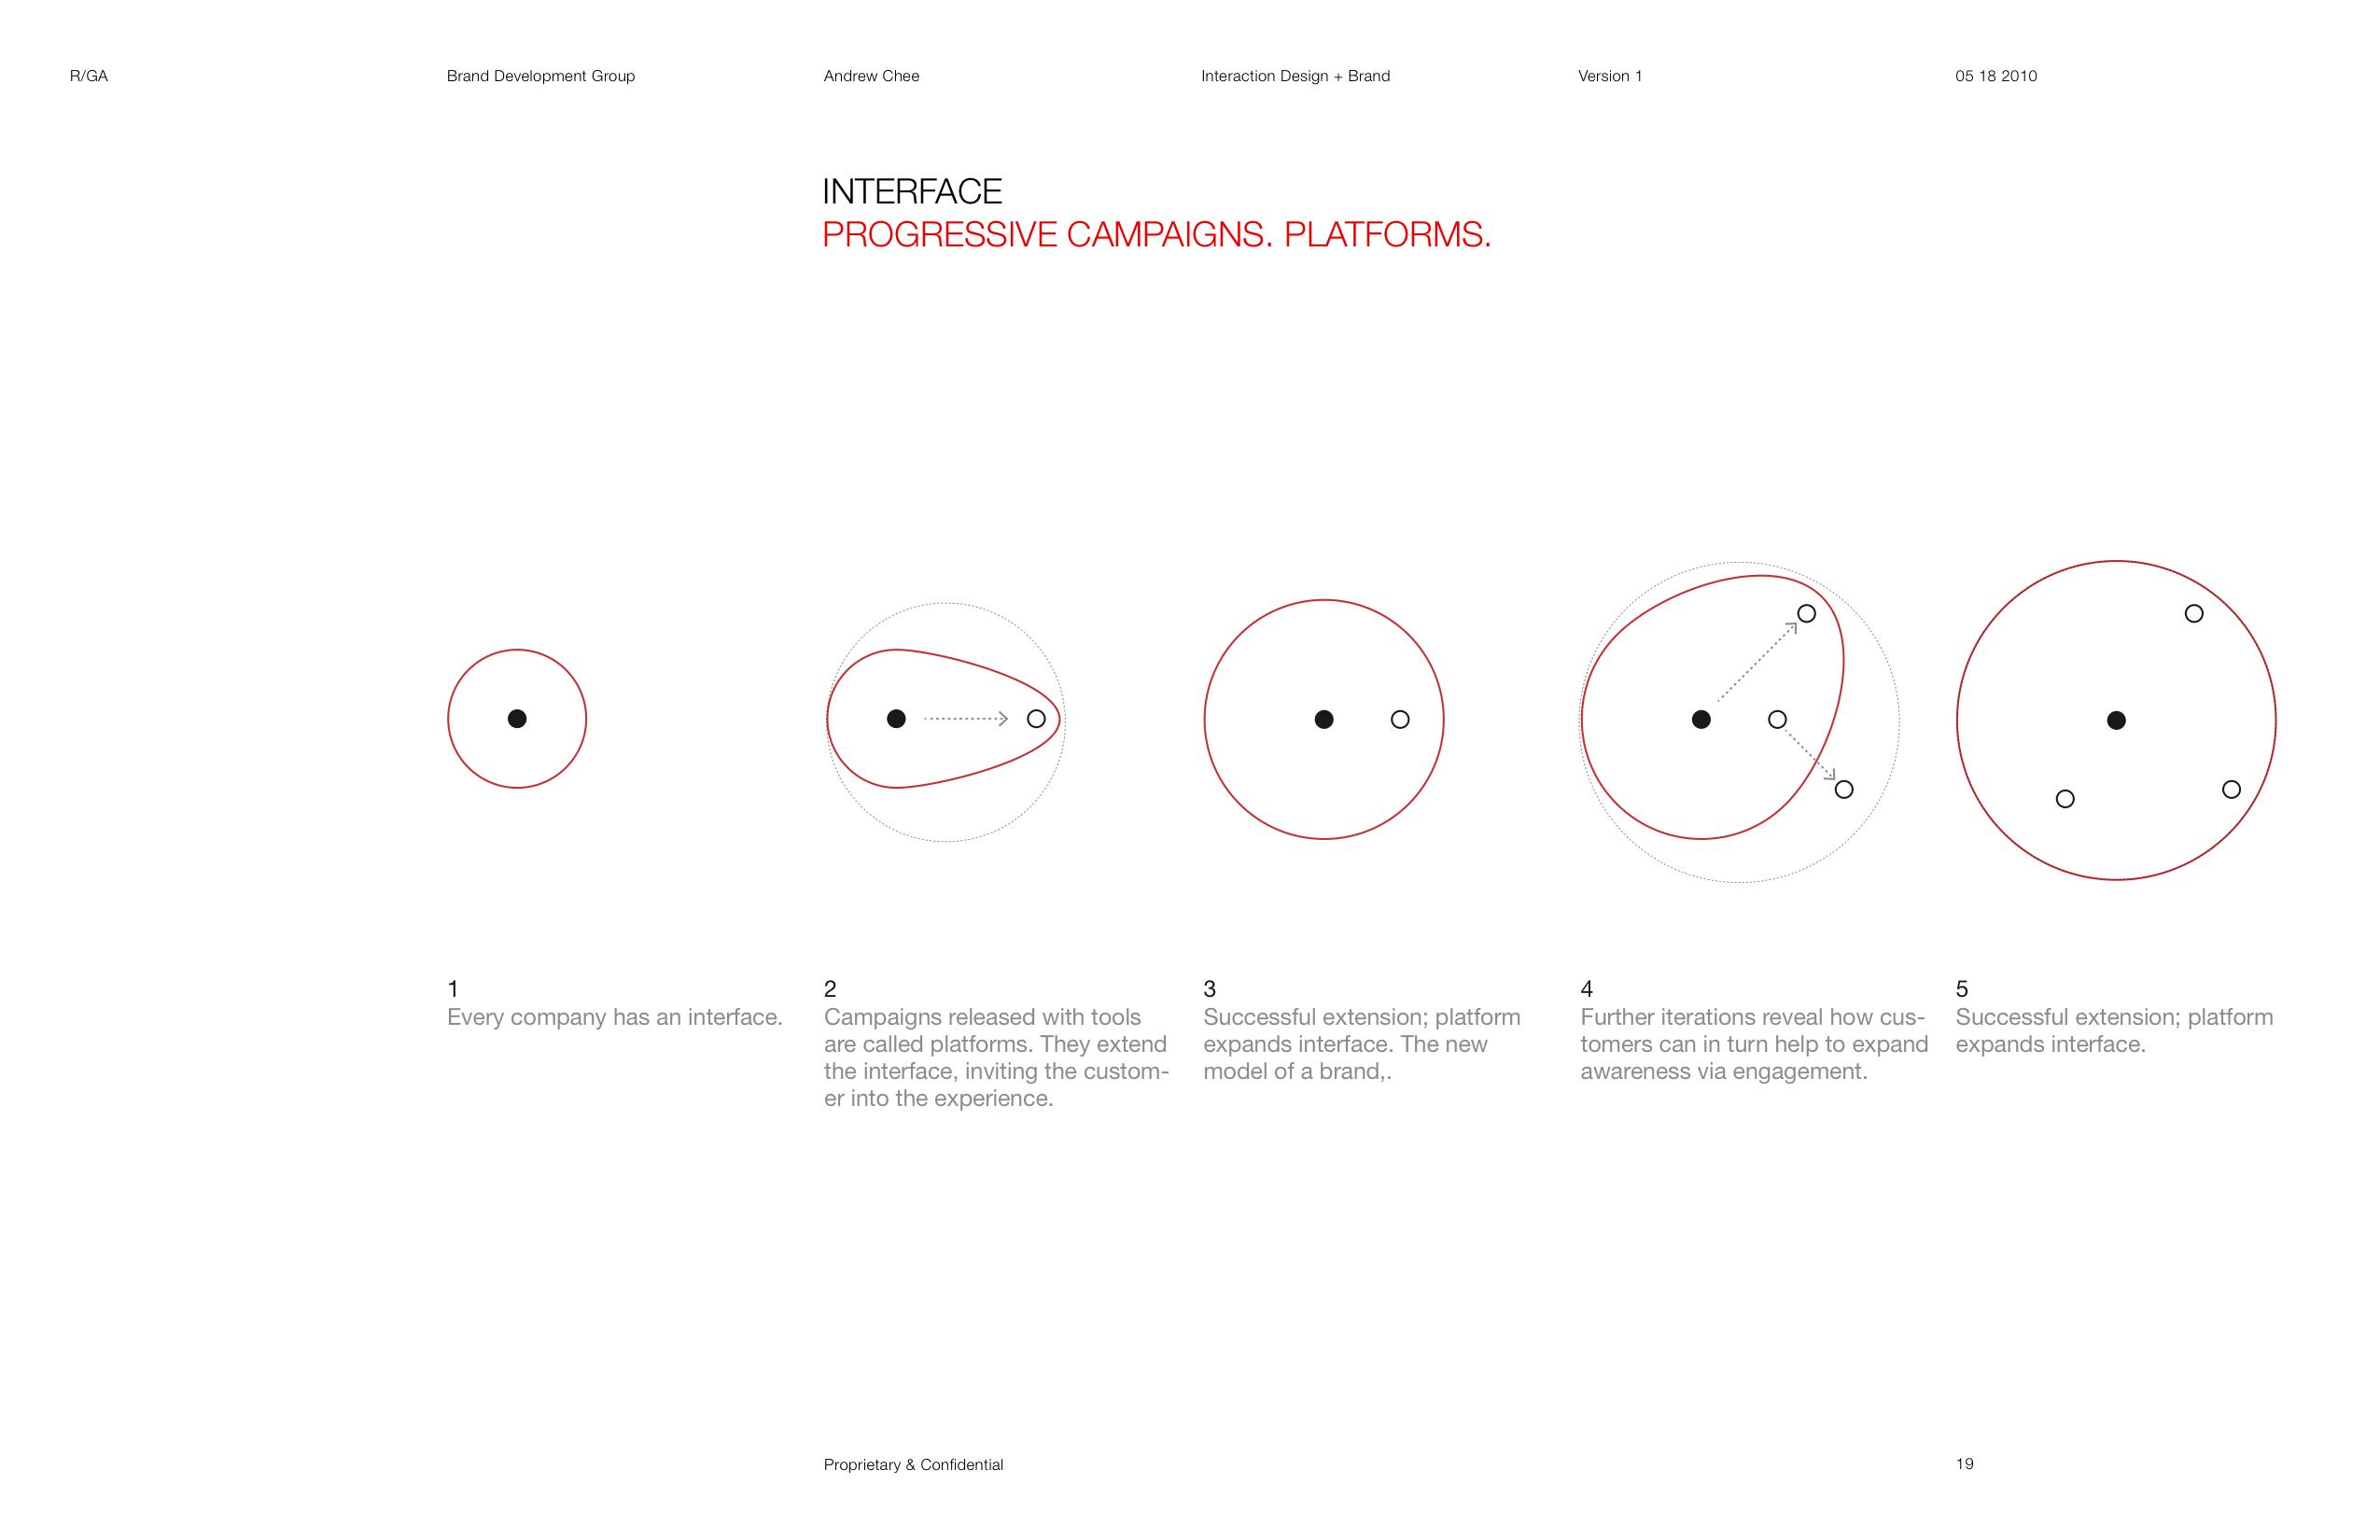 R/GA Brand Interface Concept